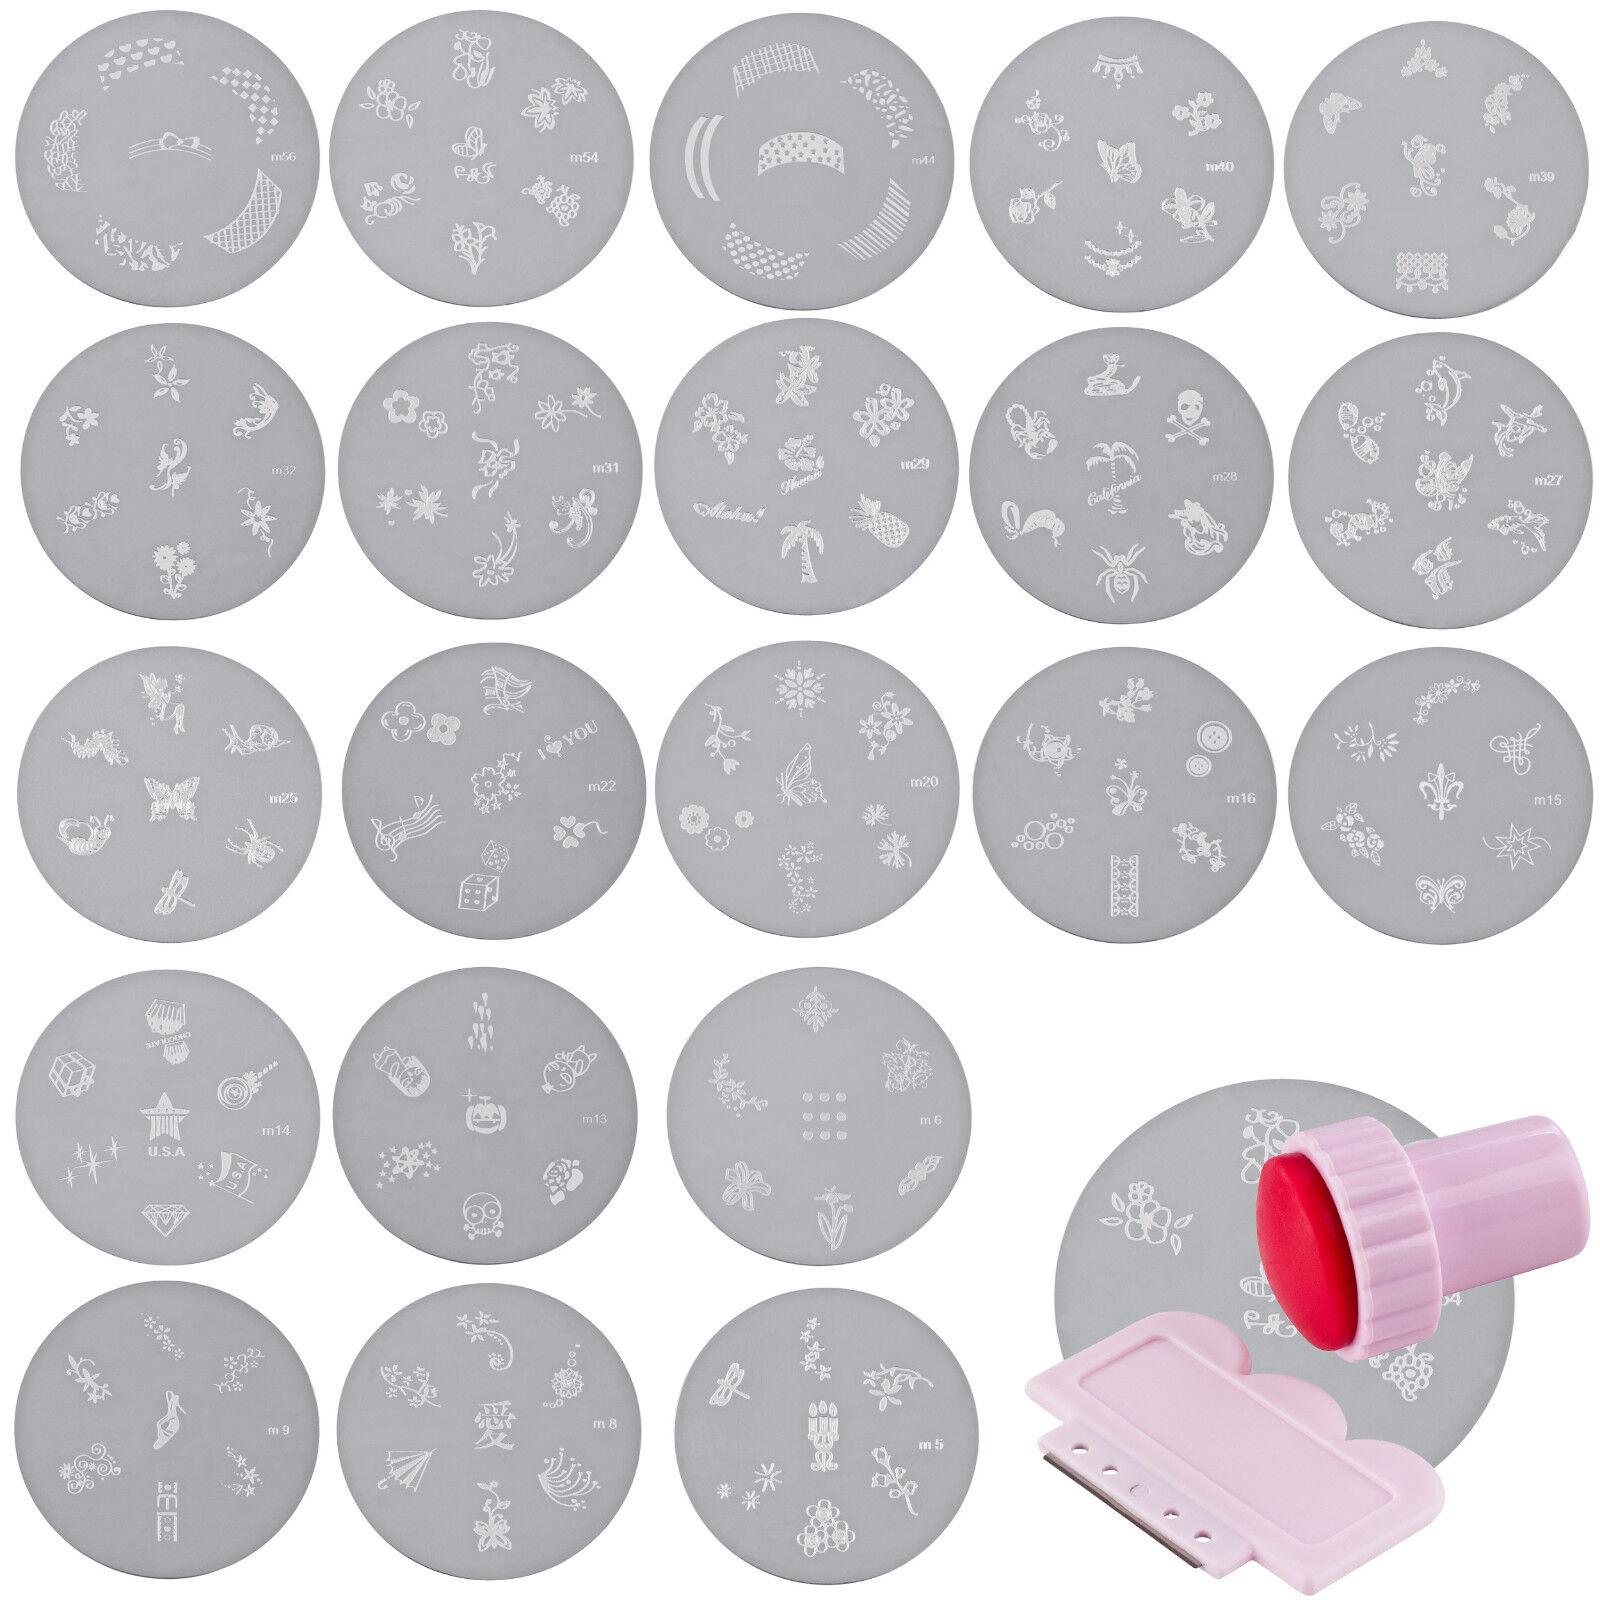 Schablone für Nagelstempel Nailstamping Metall Platte Nagel Stempel Stamping